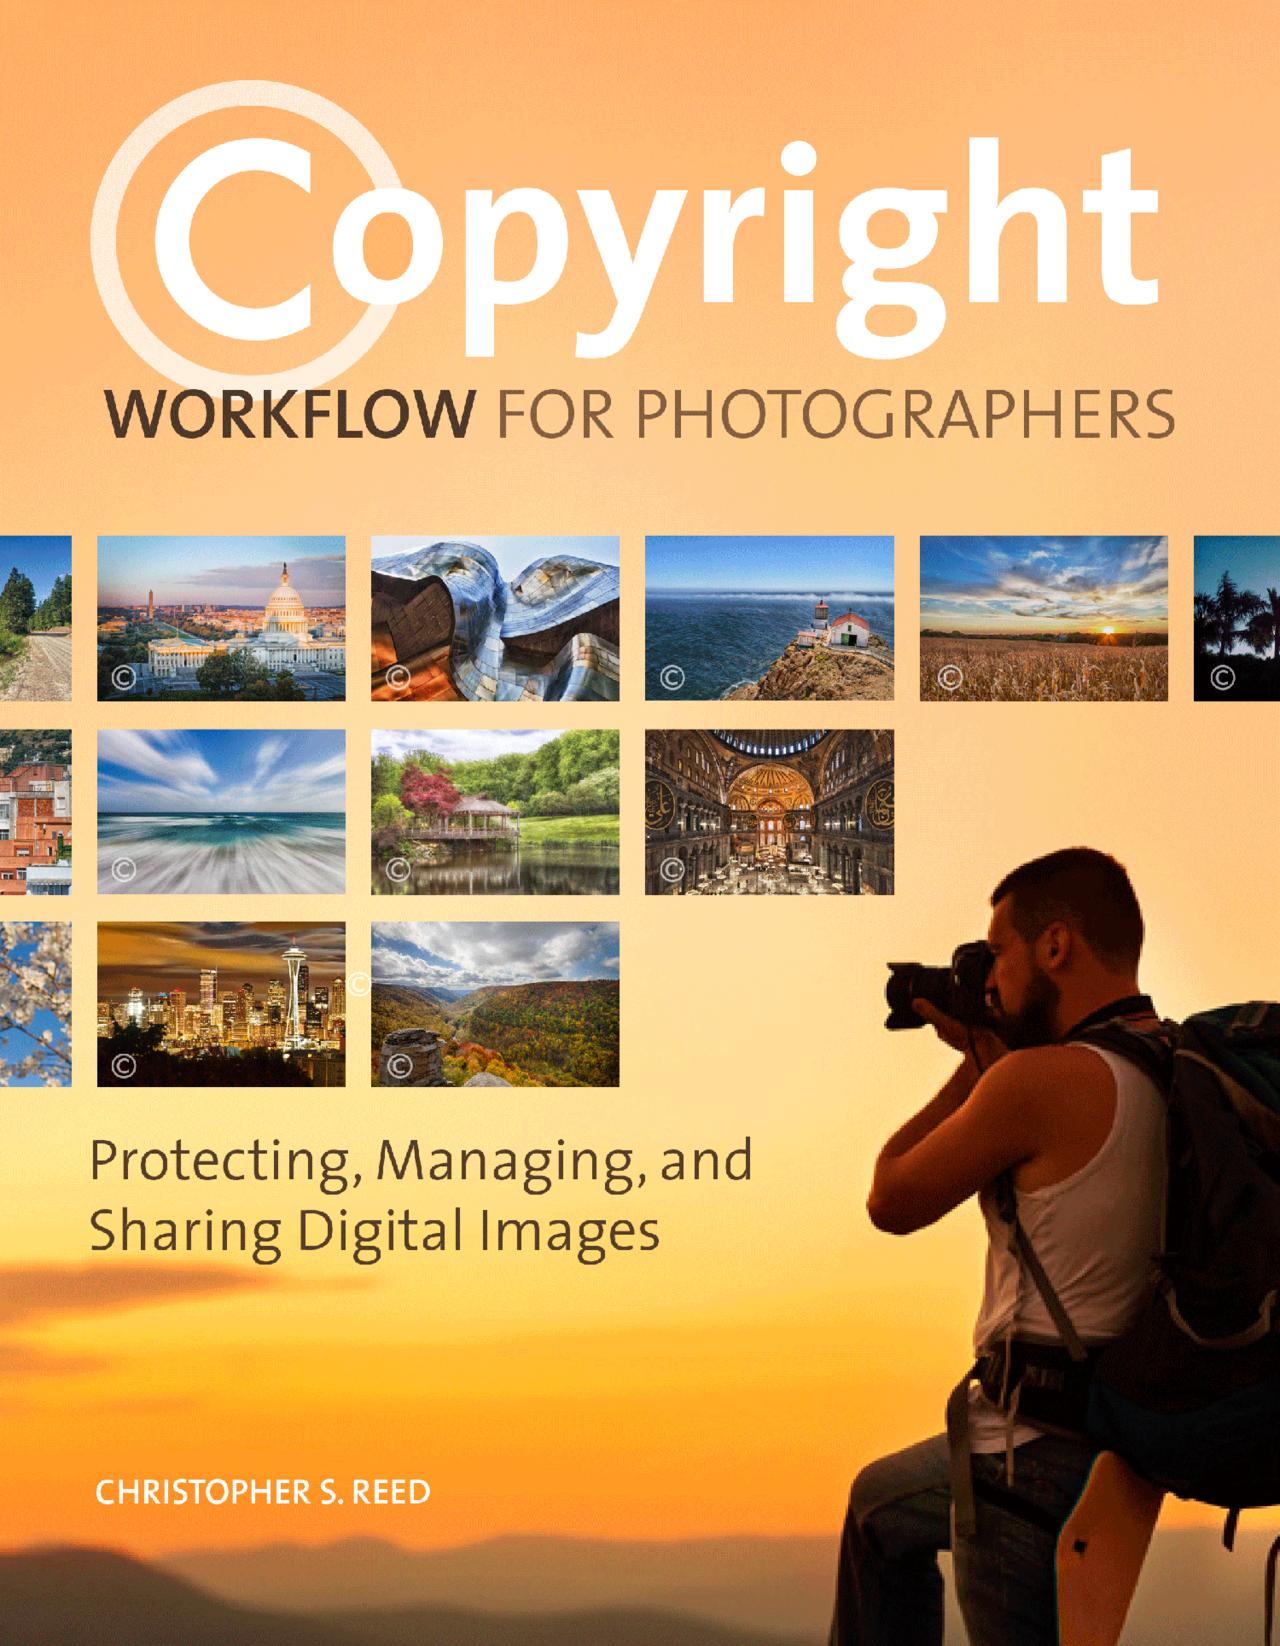 Copyrightworkflow 1500